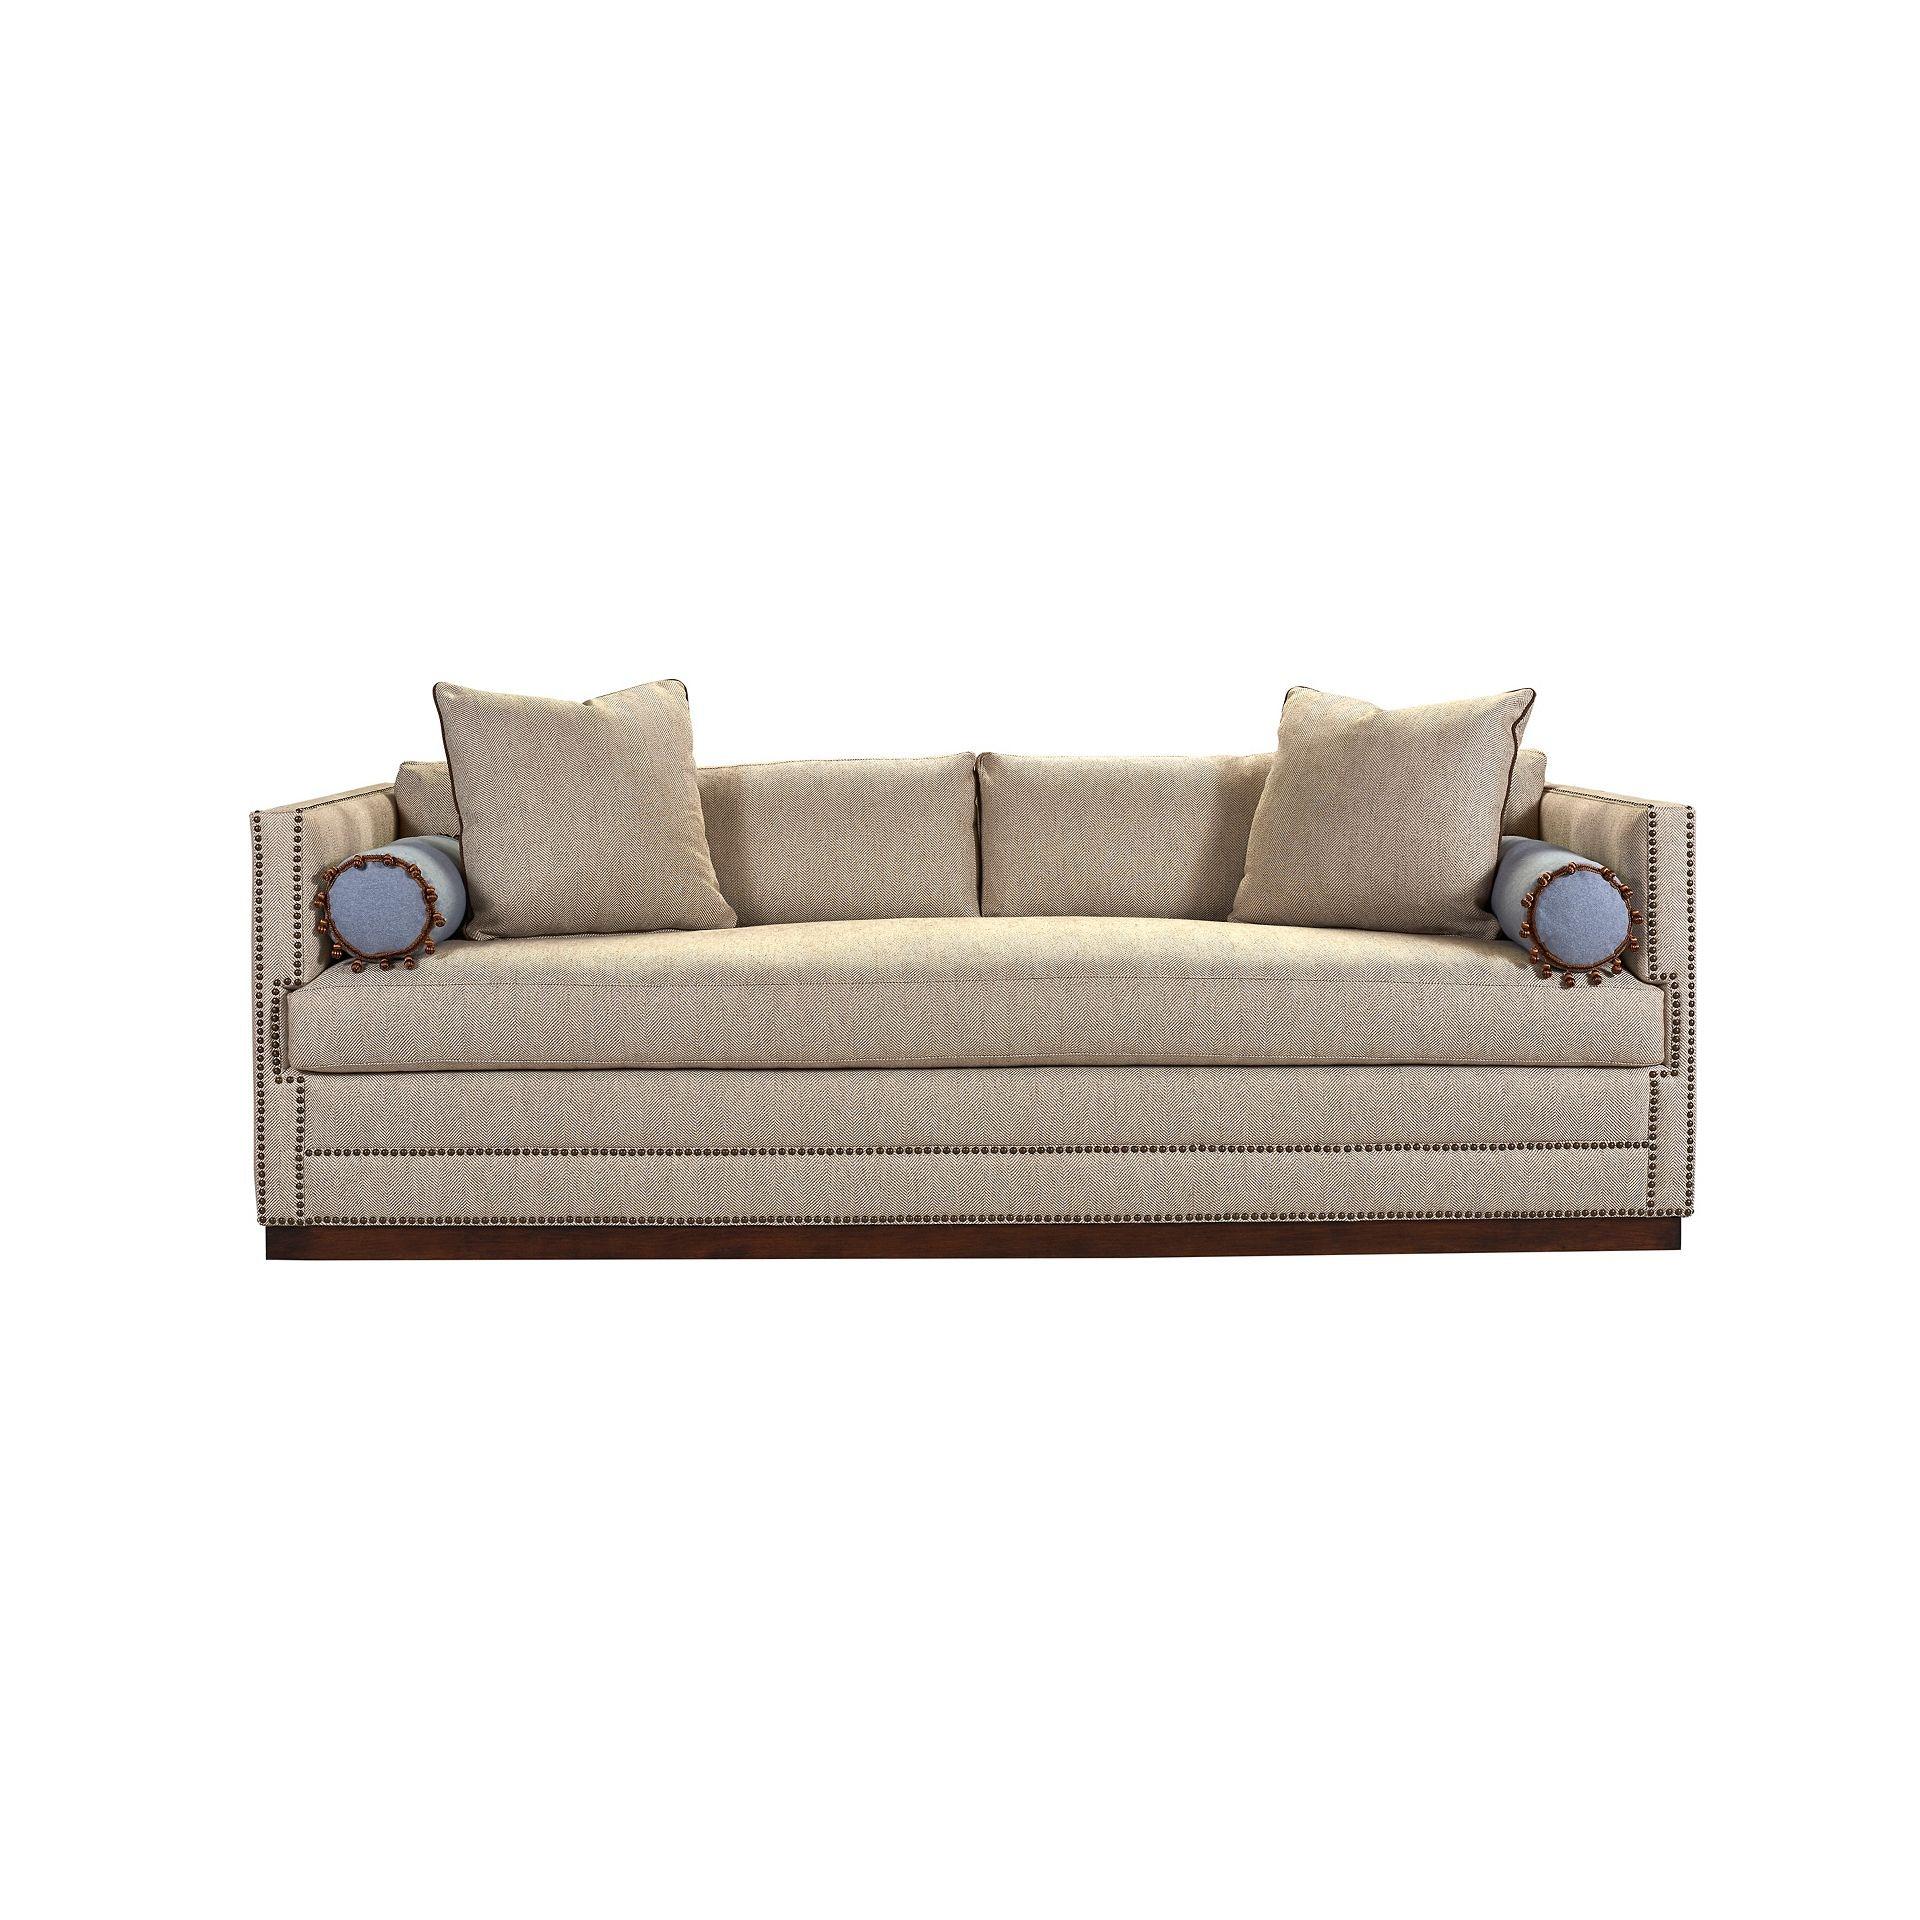 Henredon Furniture H1507 C